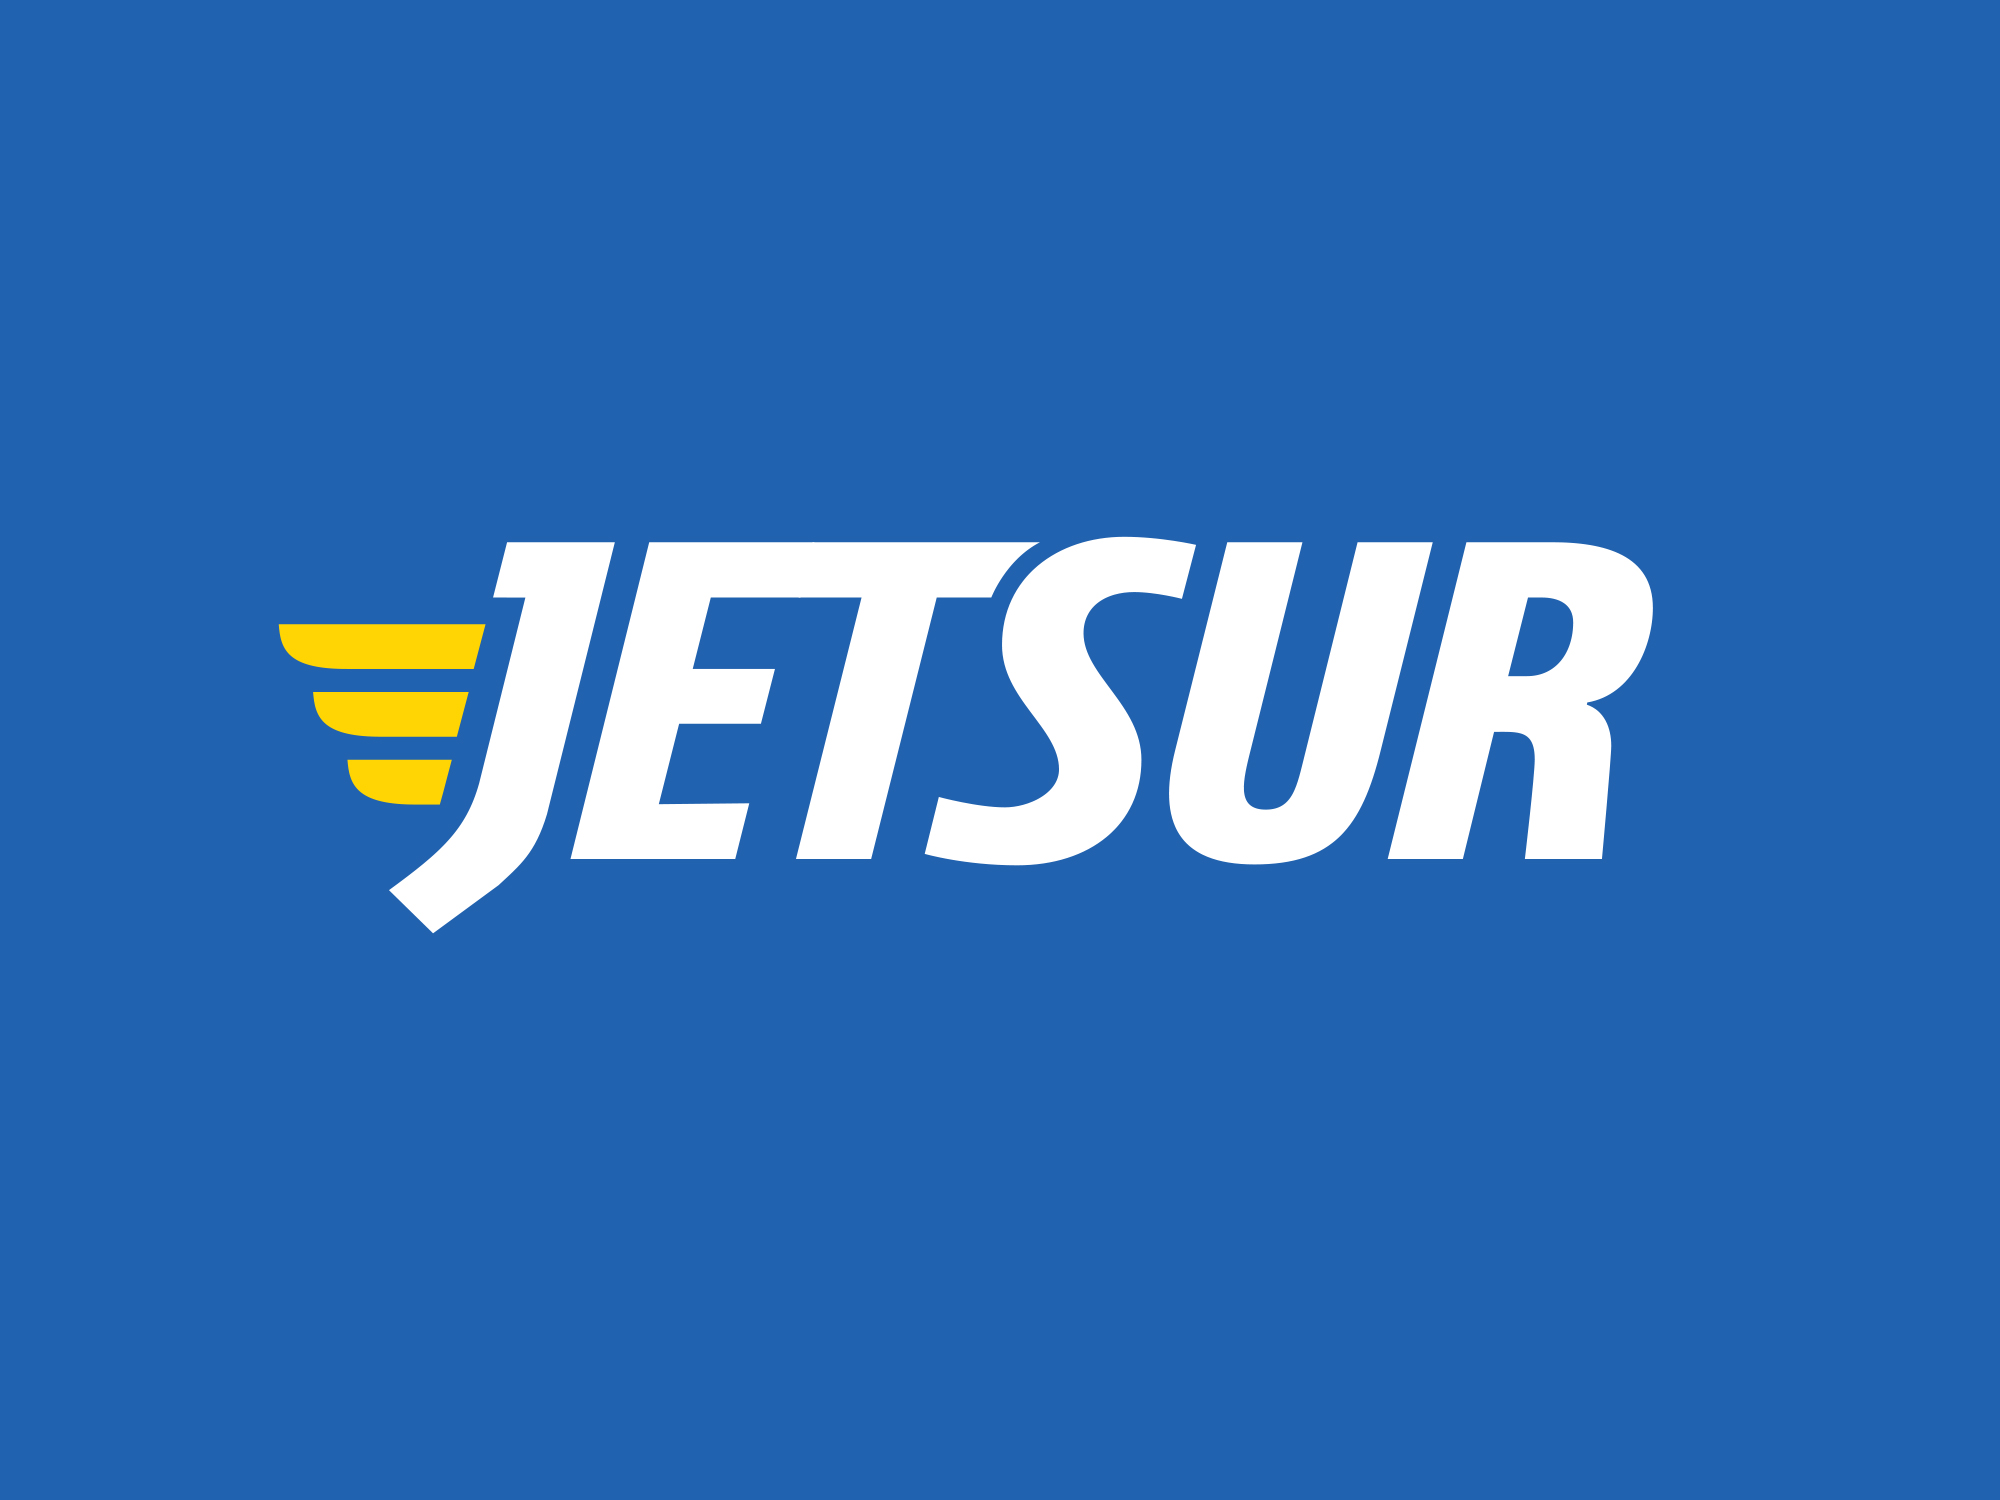 presman-jetsur-marca